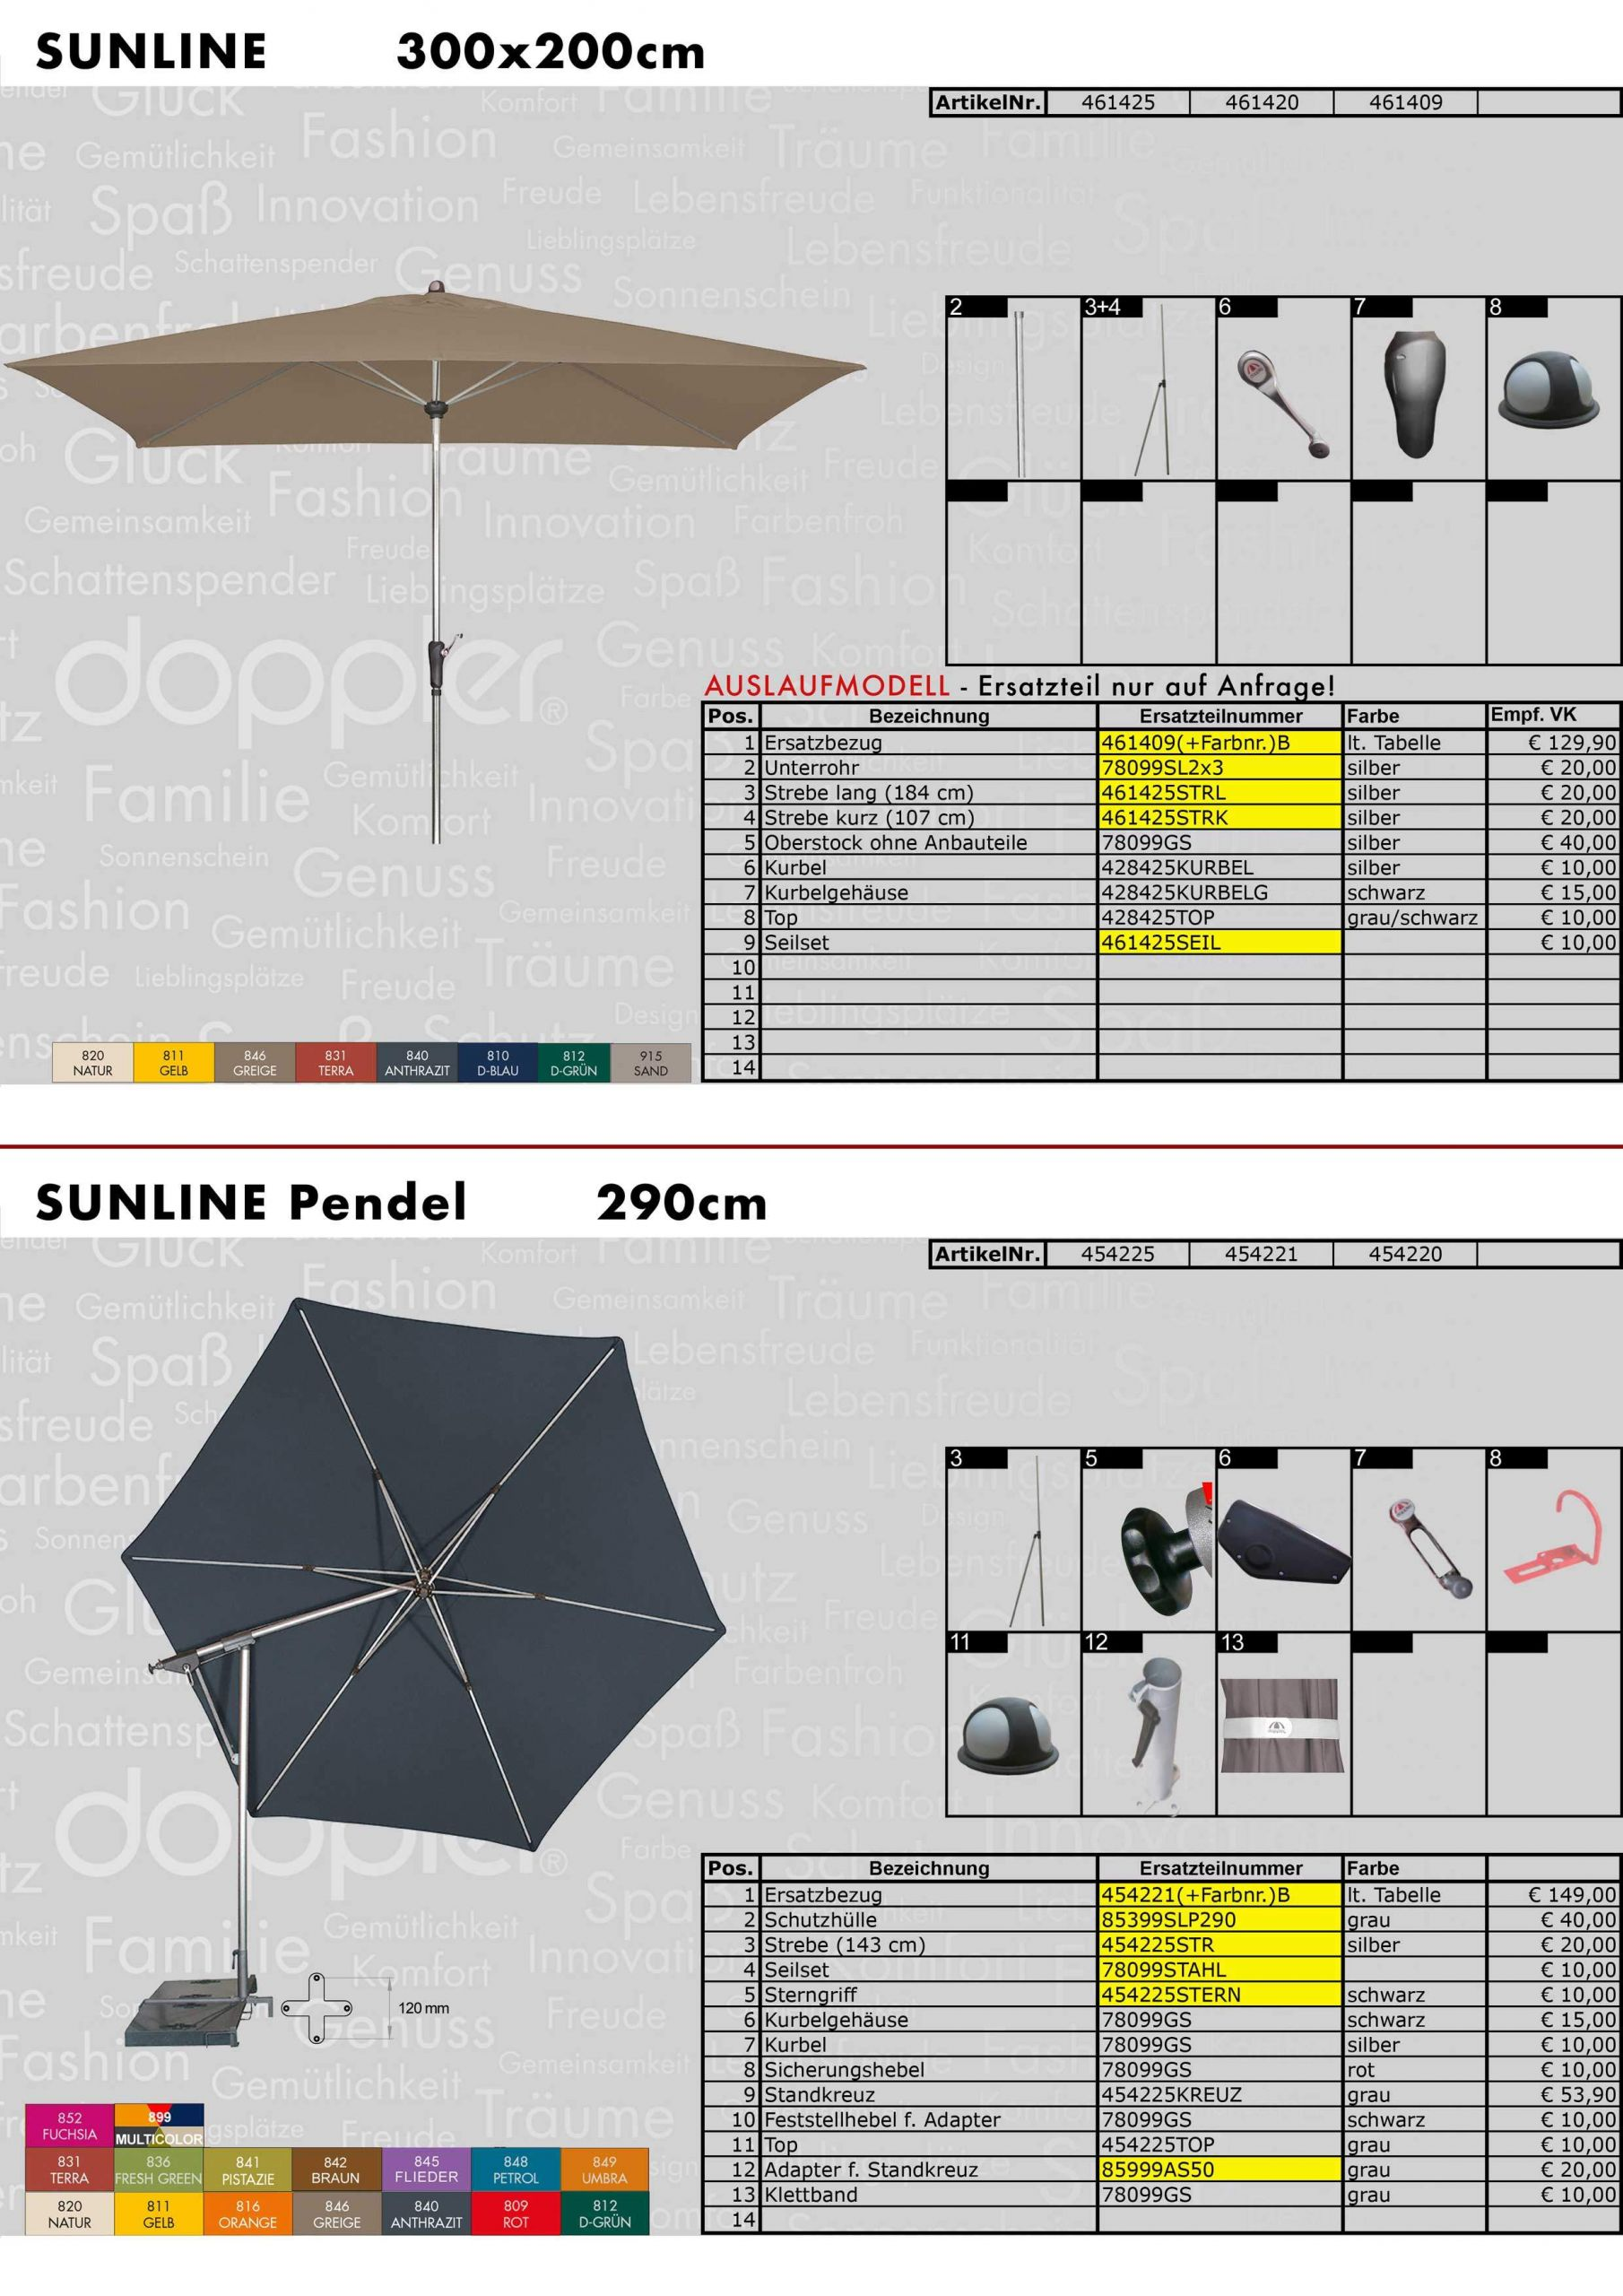 doppler Ersatzteilkatalog 2019 41 Sunline 3x2 P290